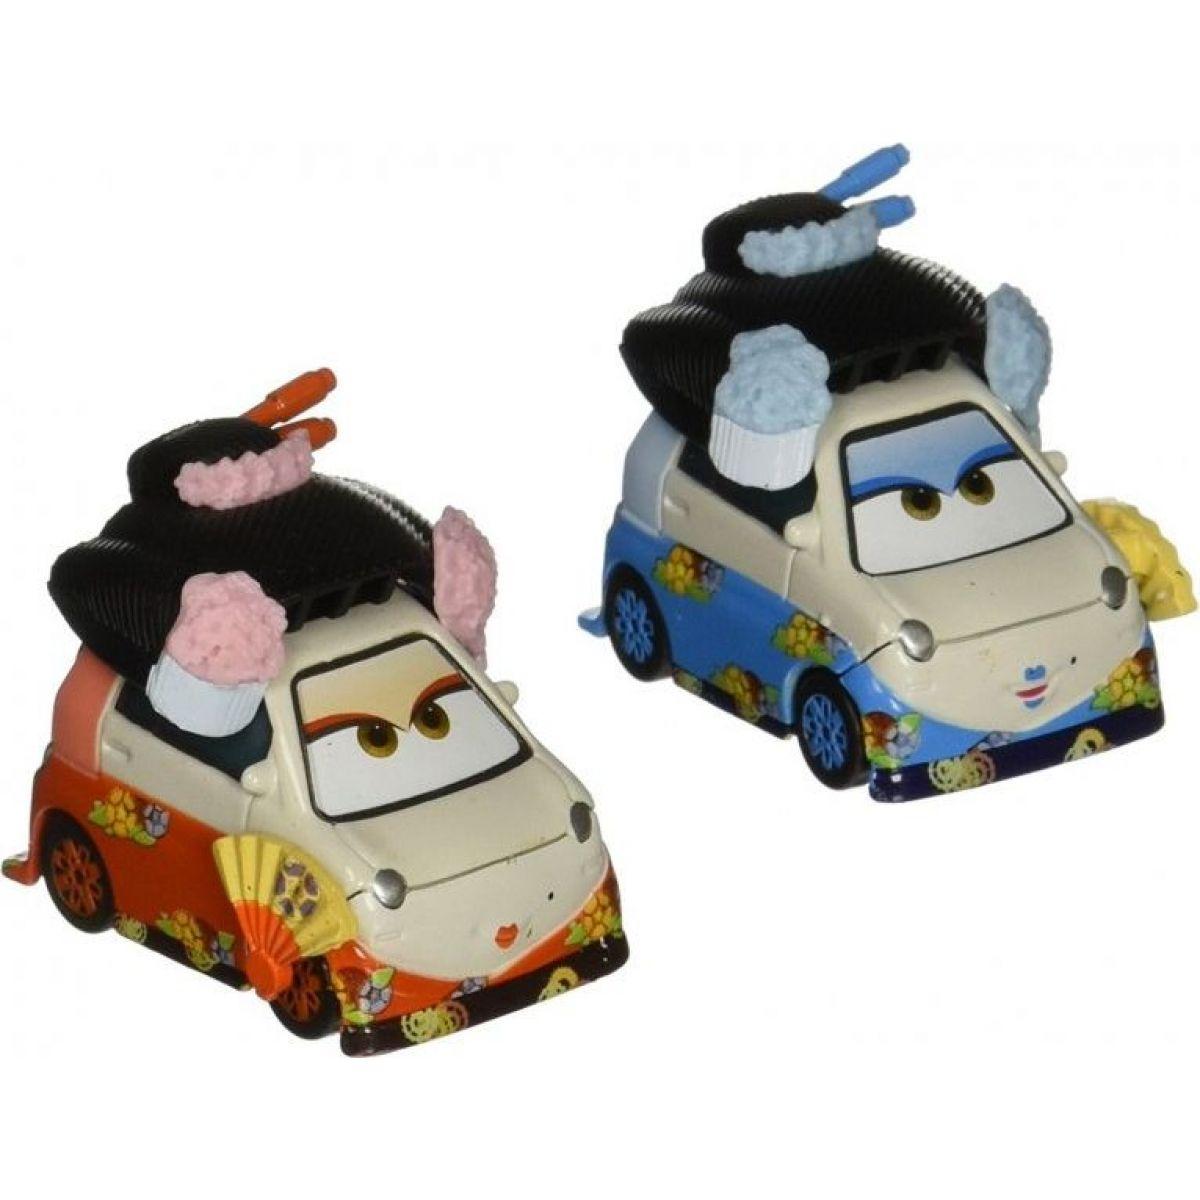 Mattel Cars 2 autíčka 2ks Y0506 Okuni a Shigeko